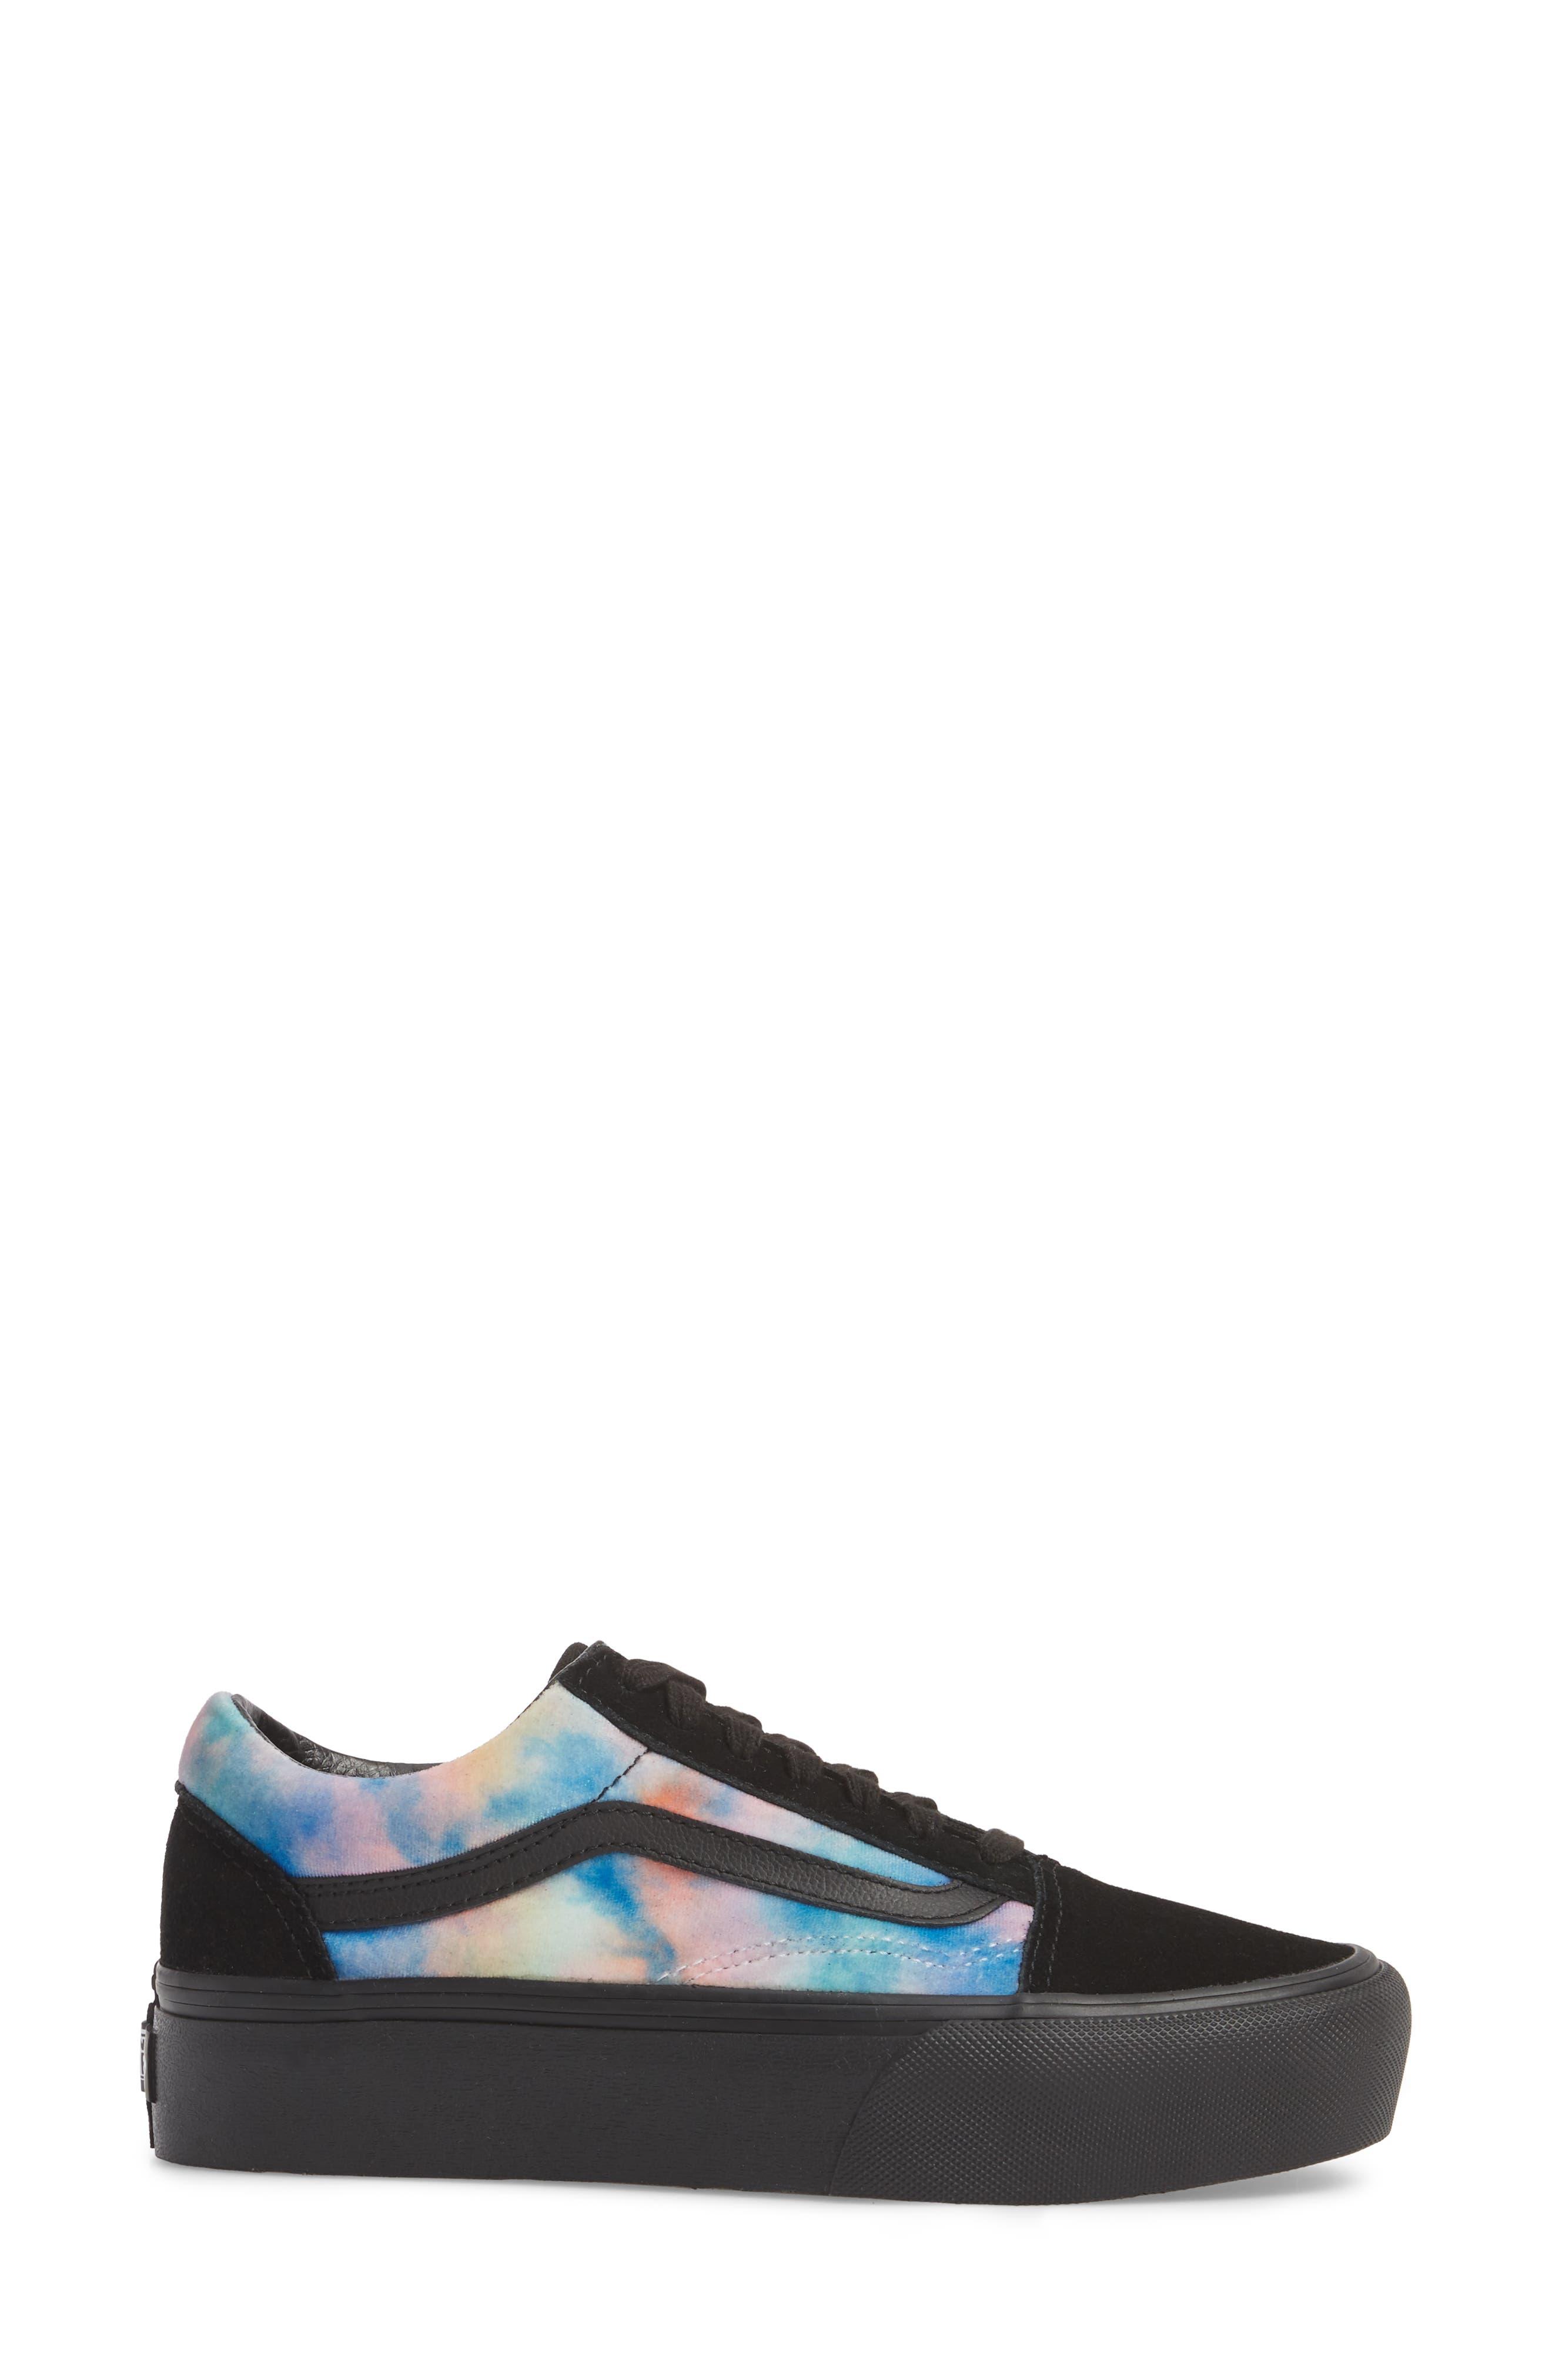 Old Skool Platform Sneaker,                             Alternate thumbnail 12, color,